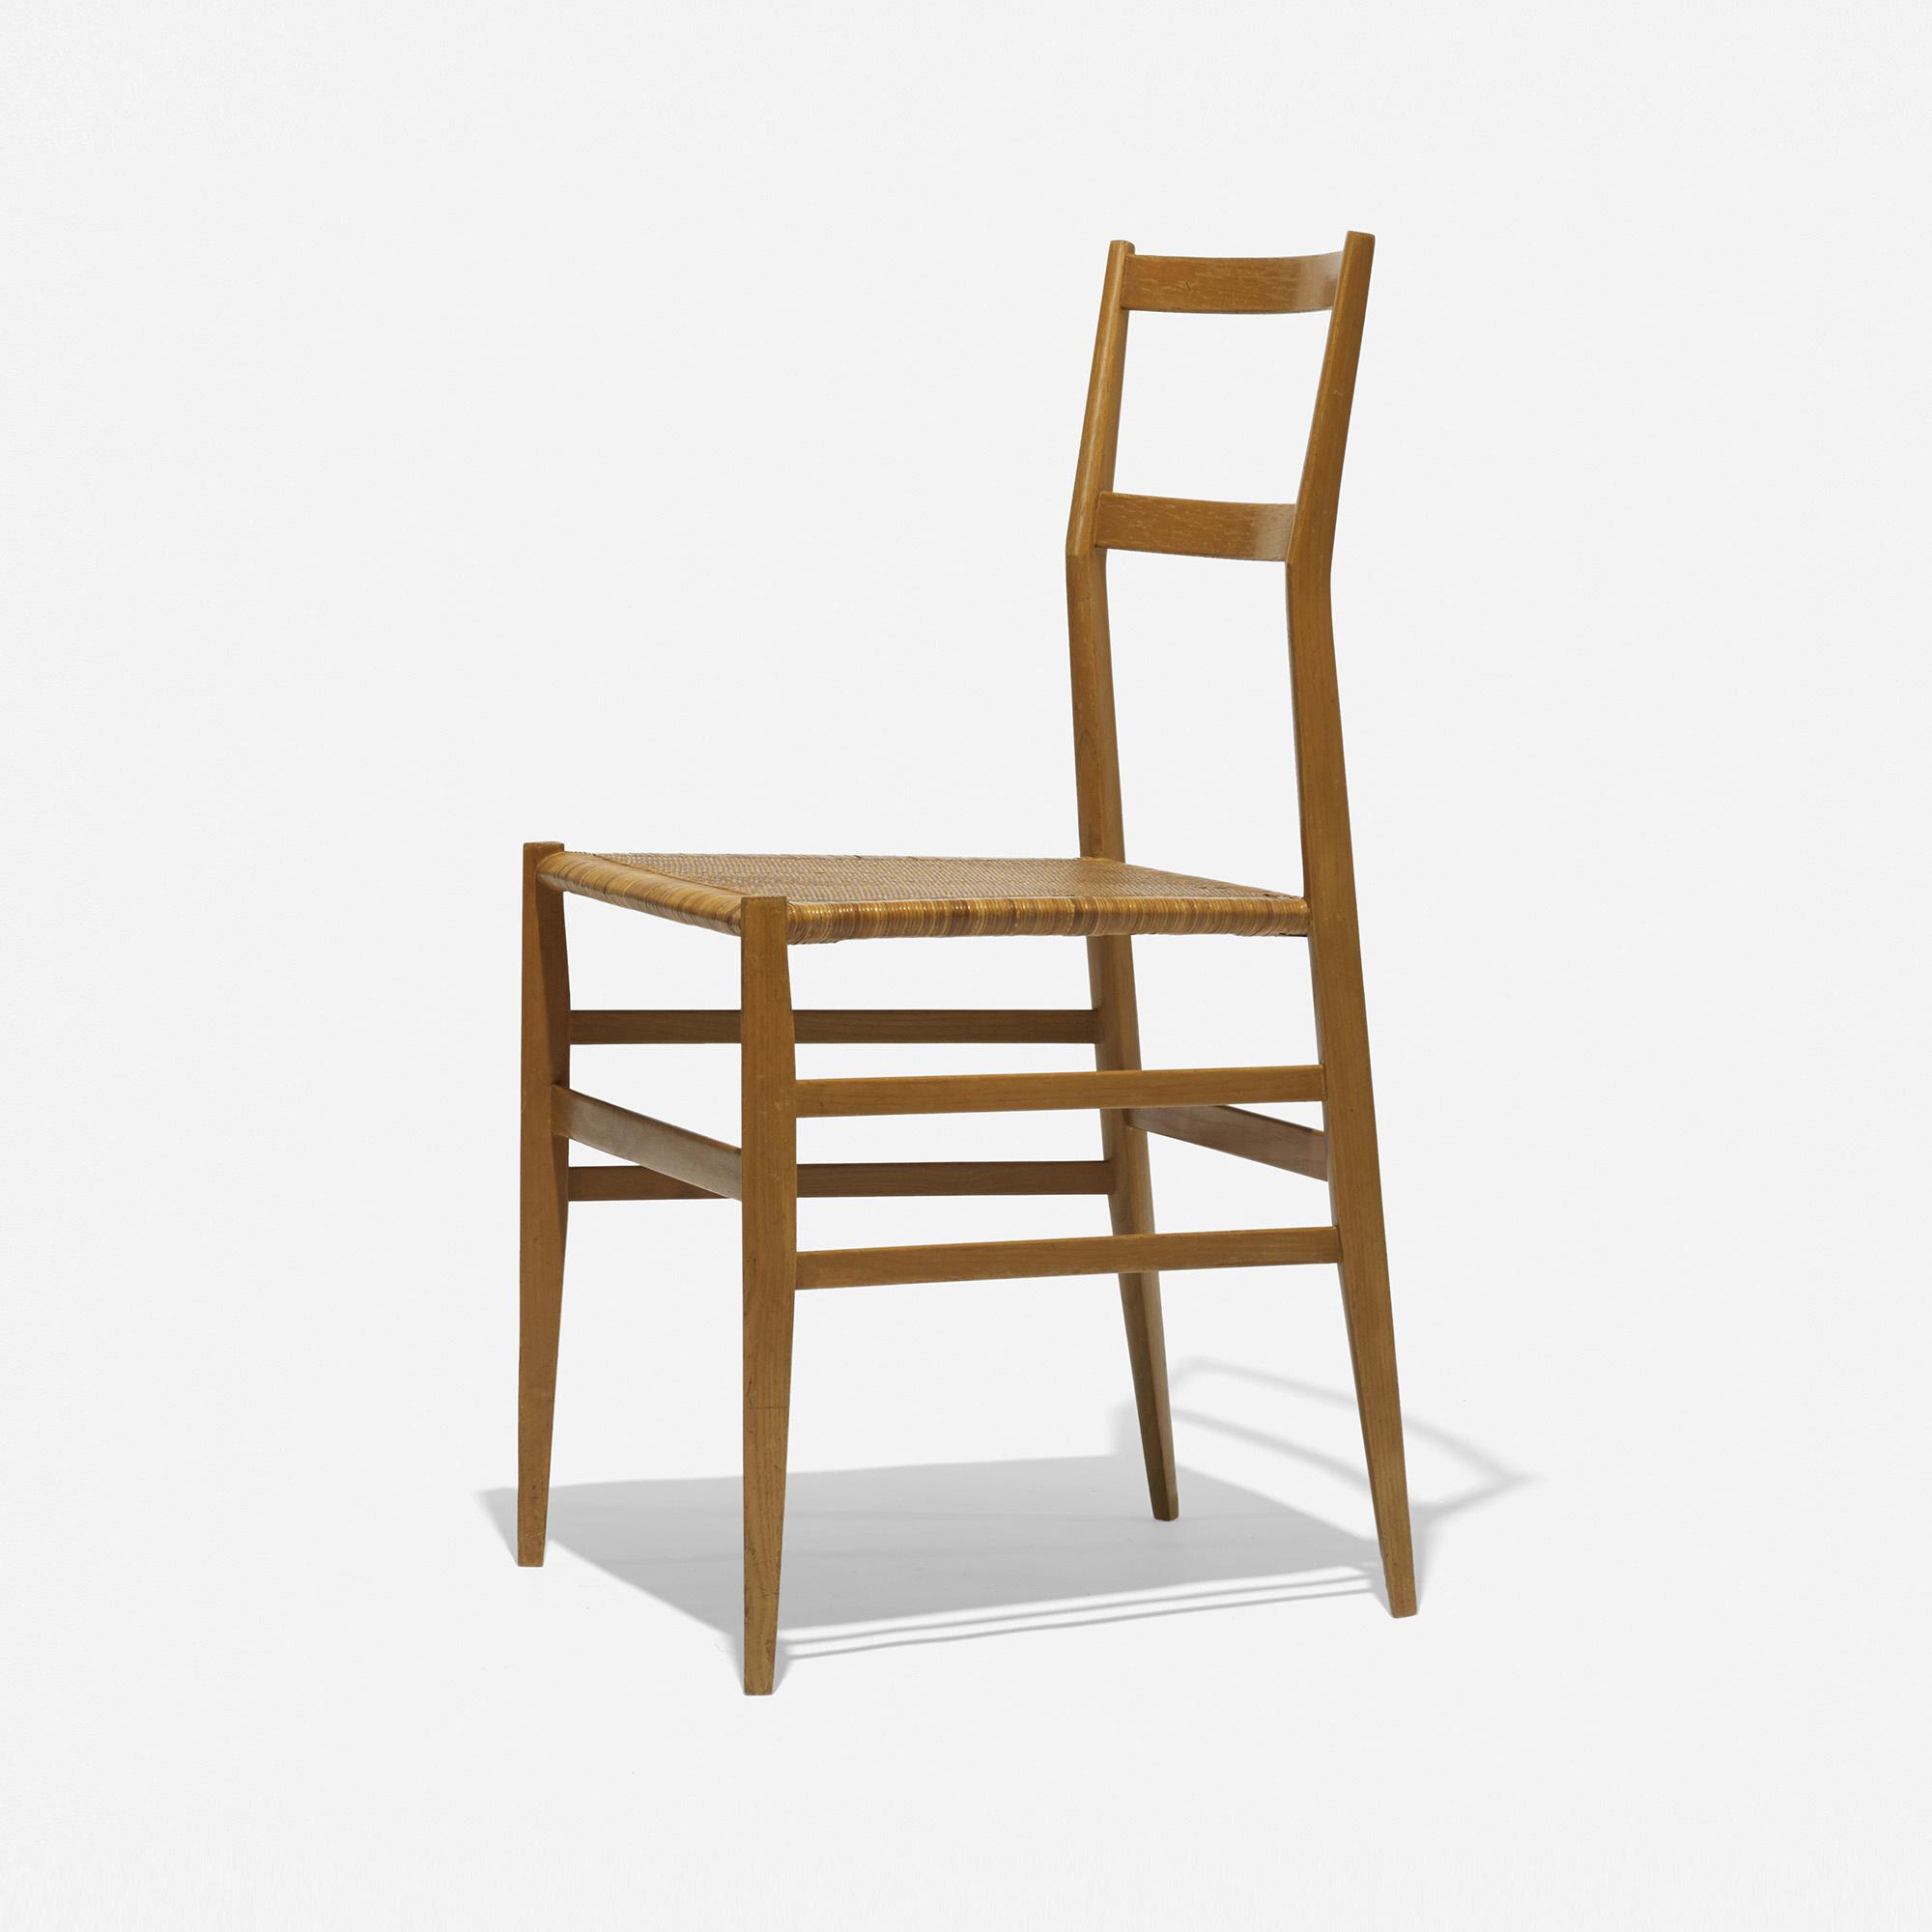 Merveilleux 214: Gio Ponti / Superleggera Chair (1 Of 5)